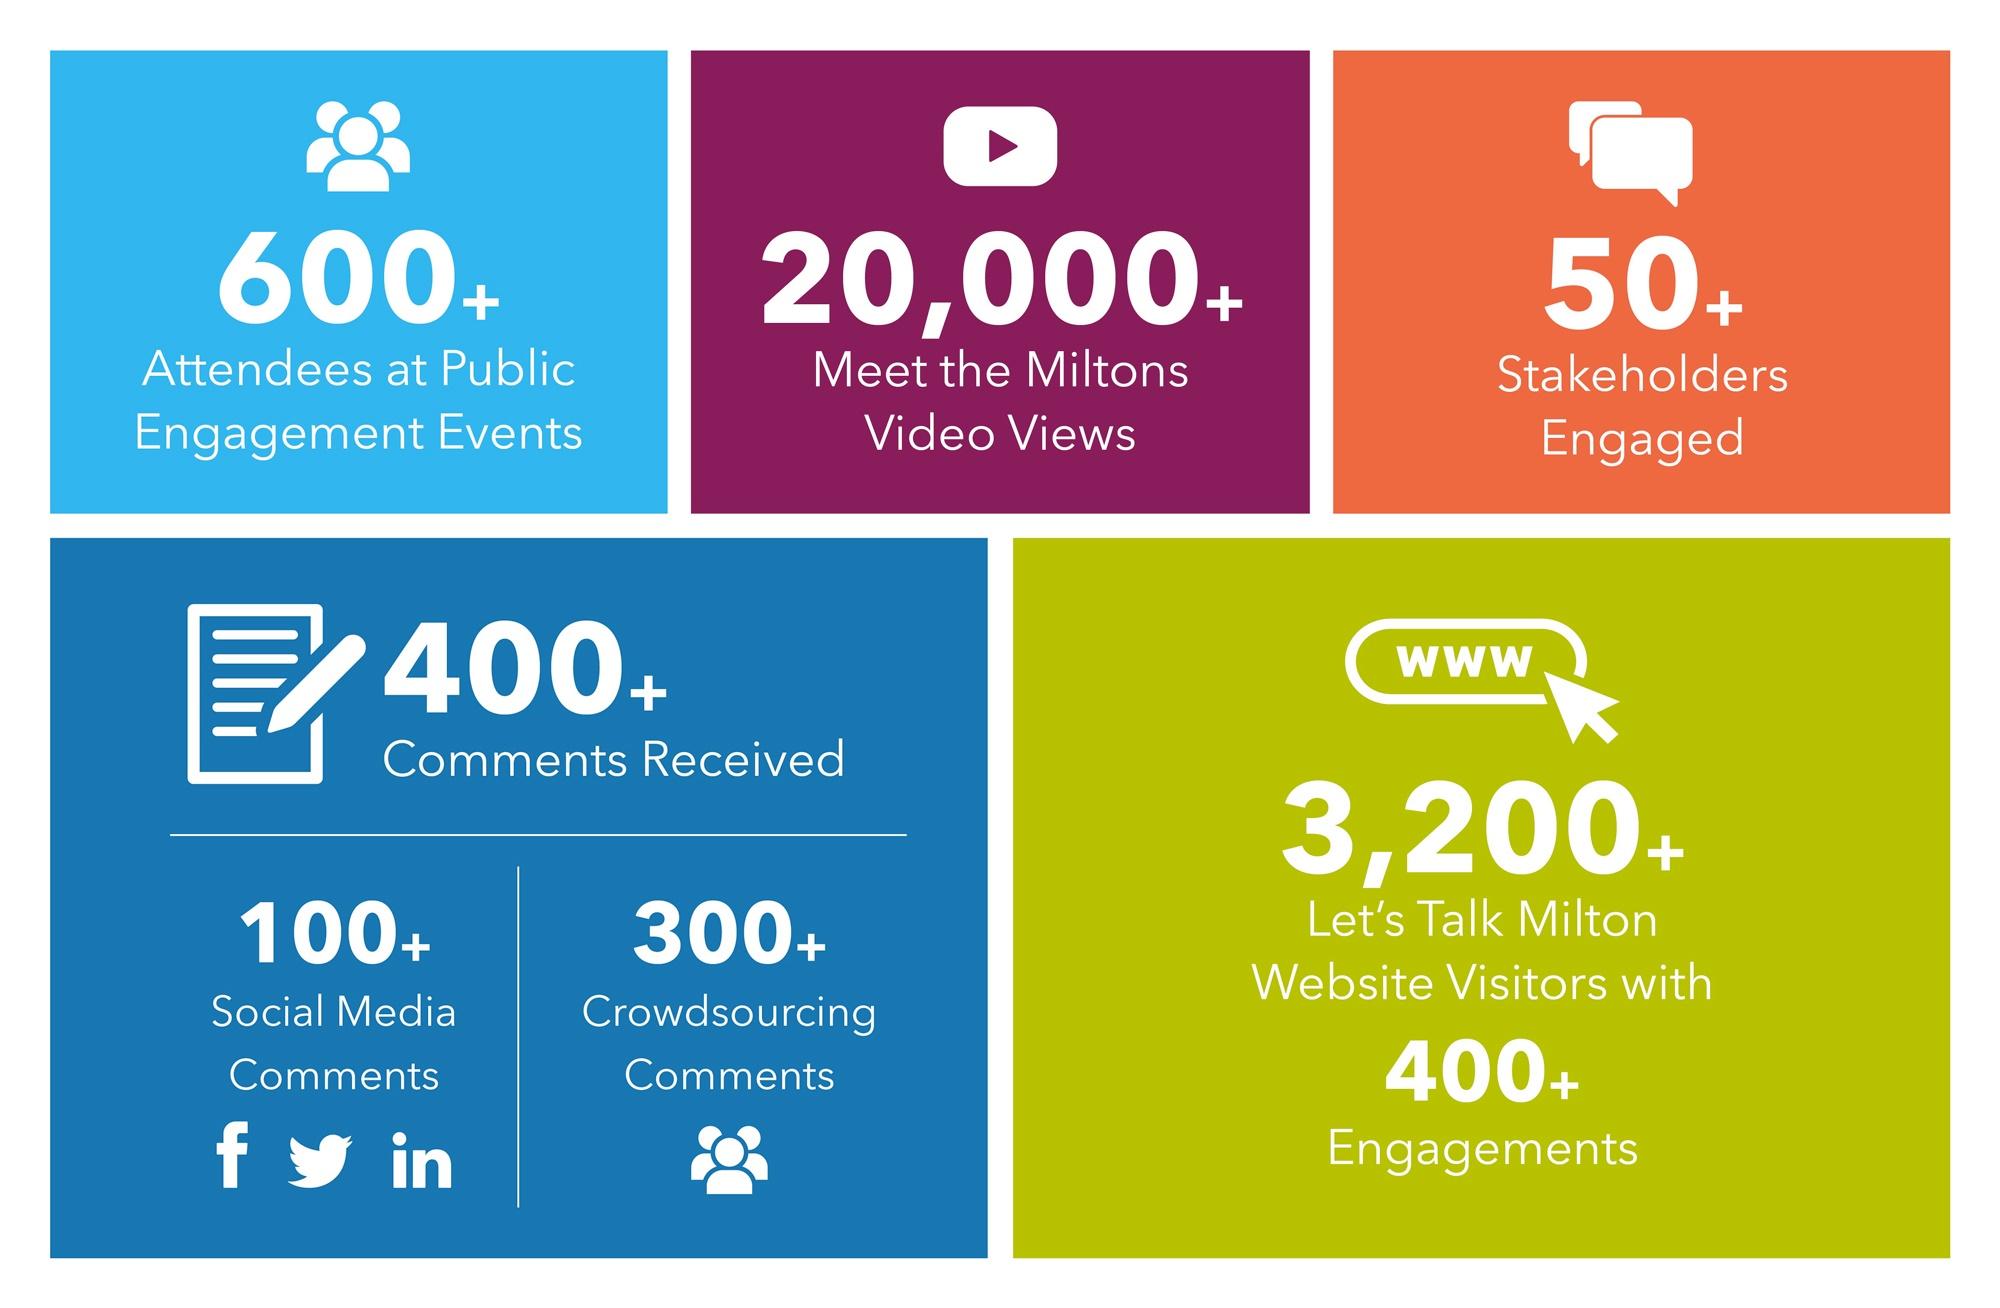 Engagement statistics graphic